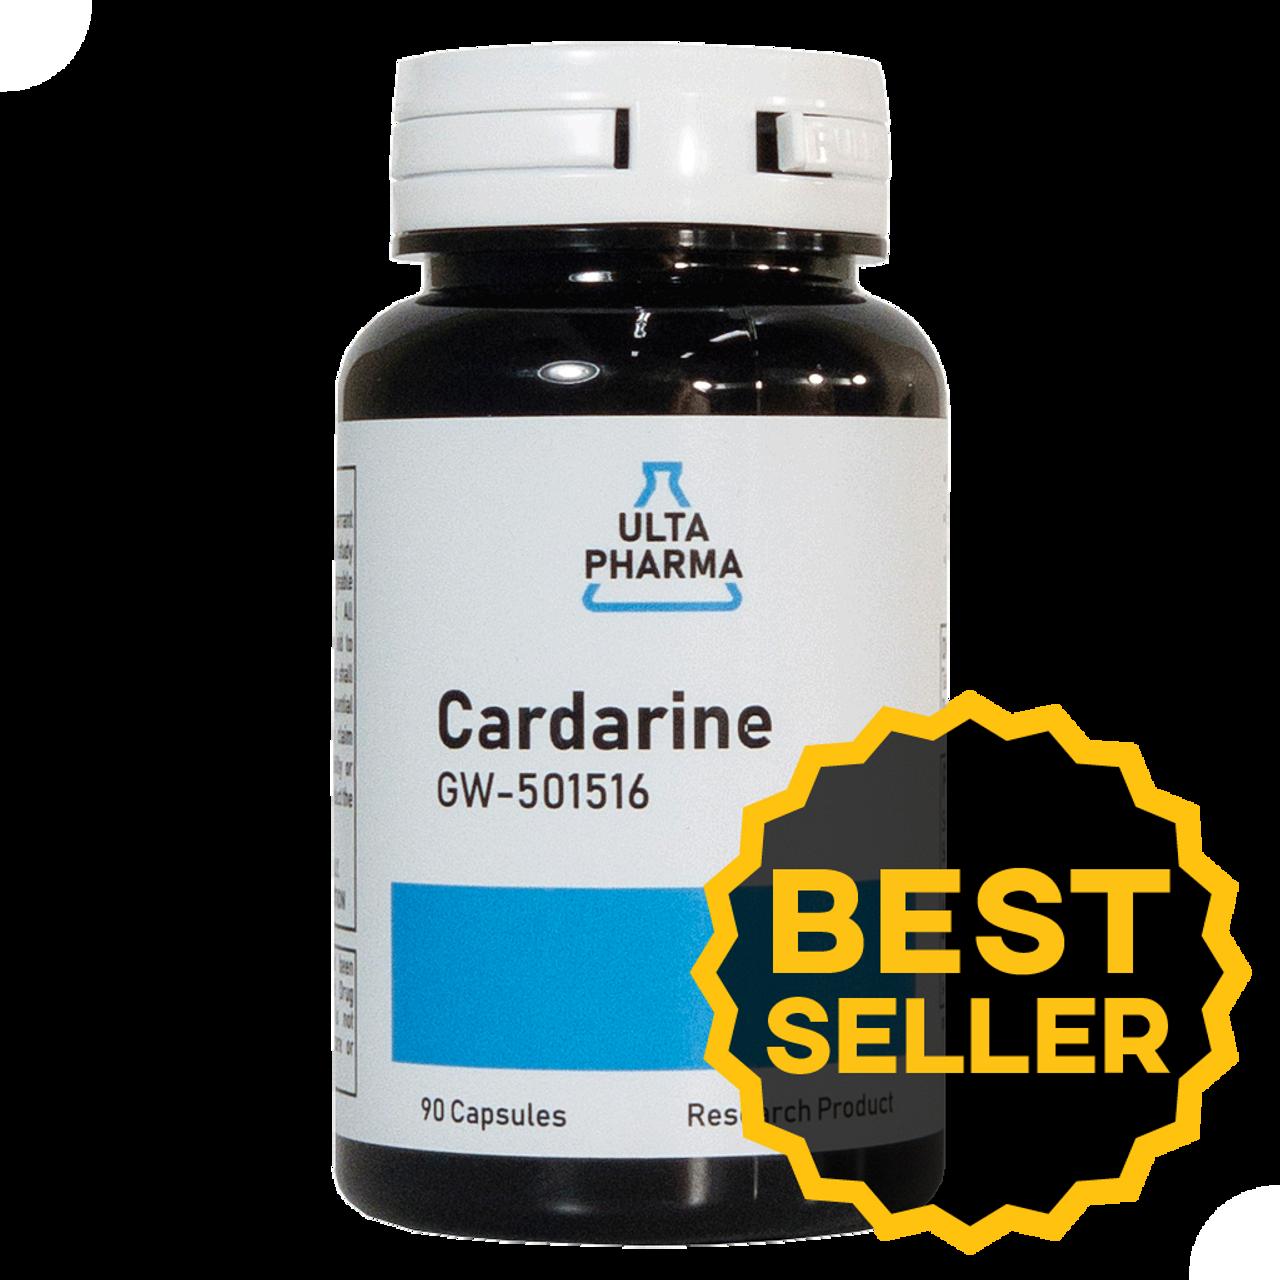 Cardarine GW-501516 Capsules by Ulta Pharma